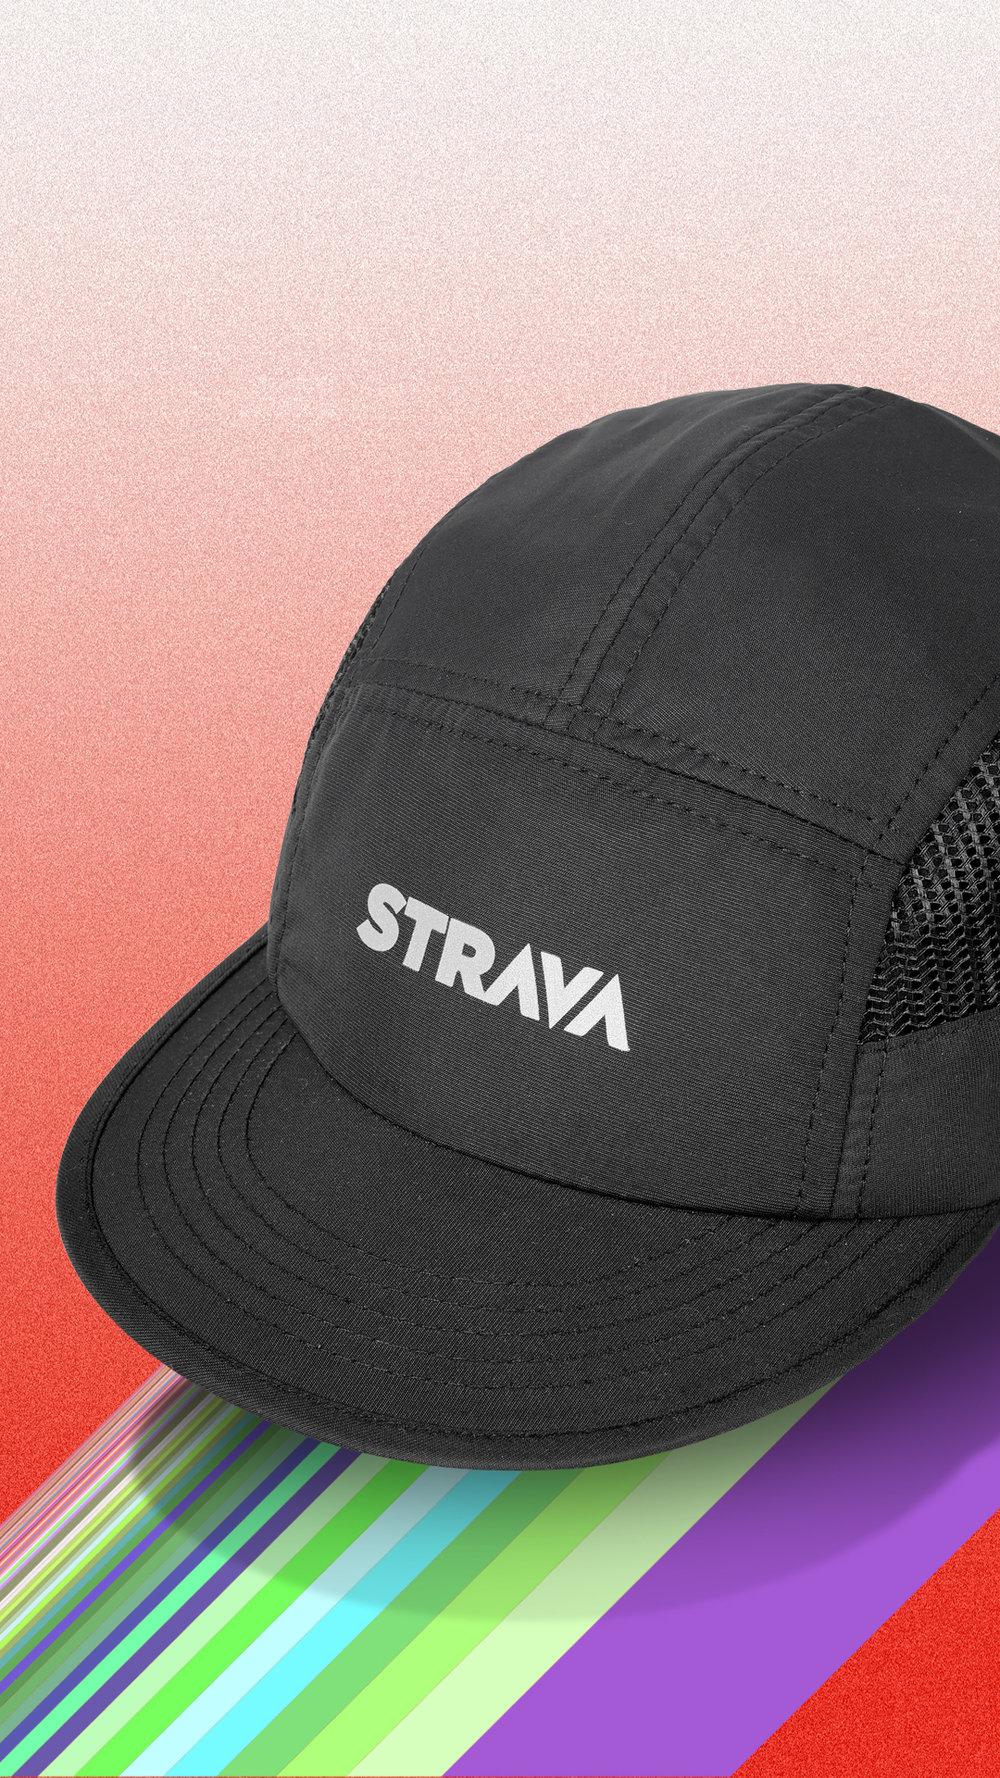 IG Story STRAVA 1.jpg